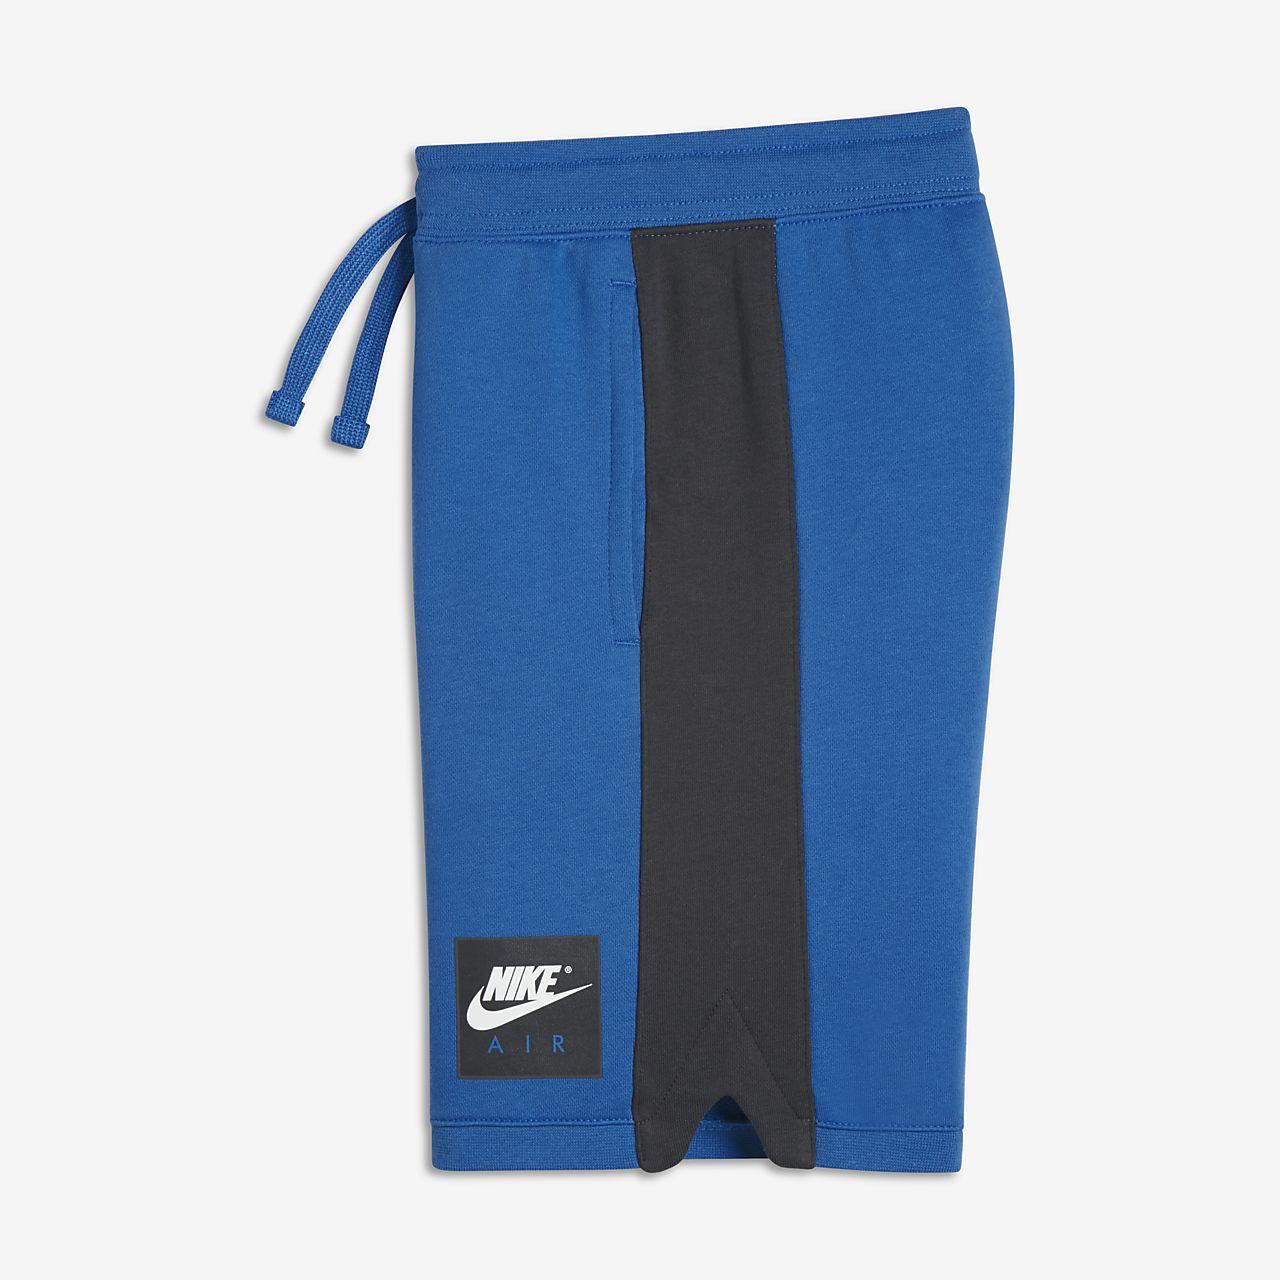 b647fc9a9a Nike Air Older Kids' (Boys') Shorts